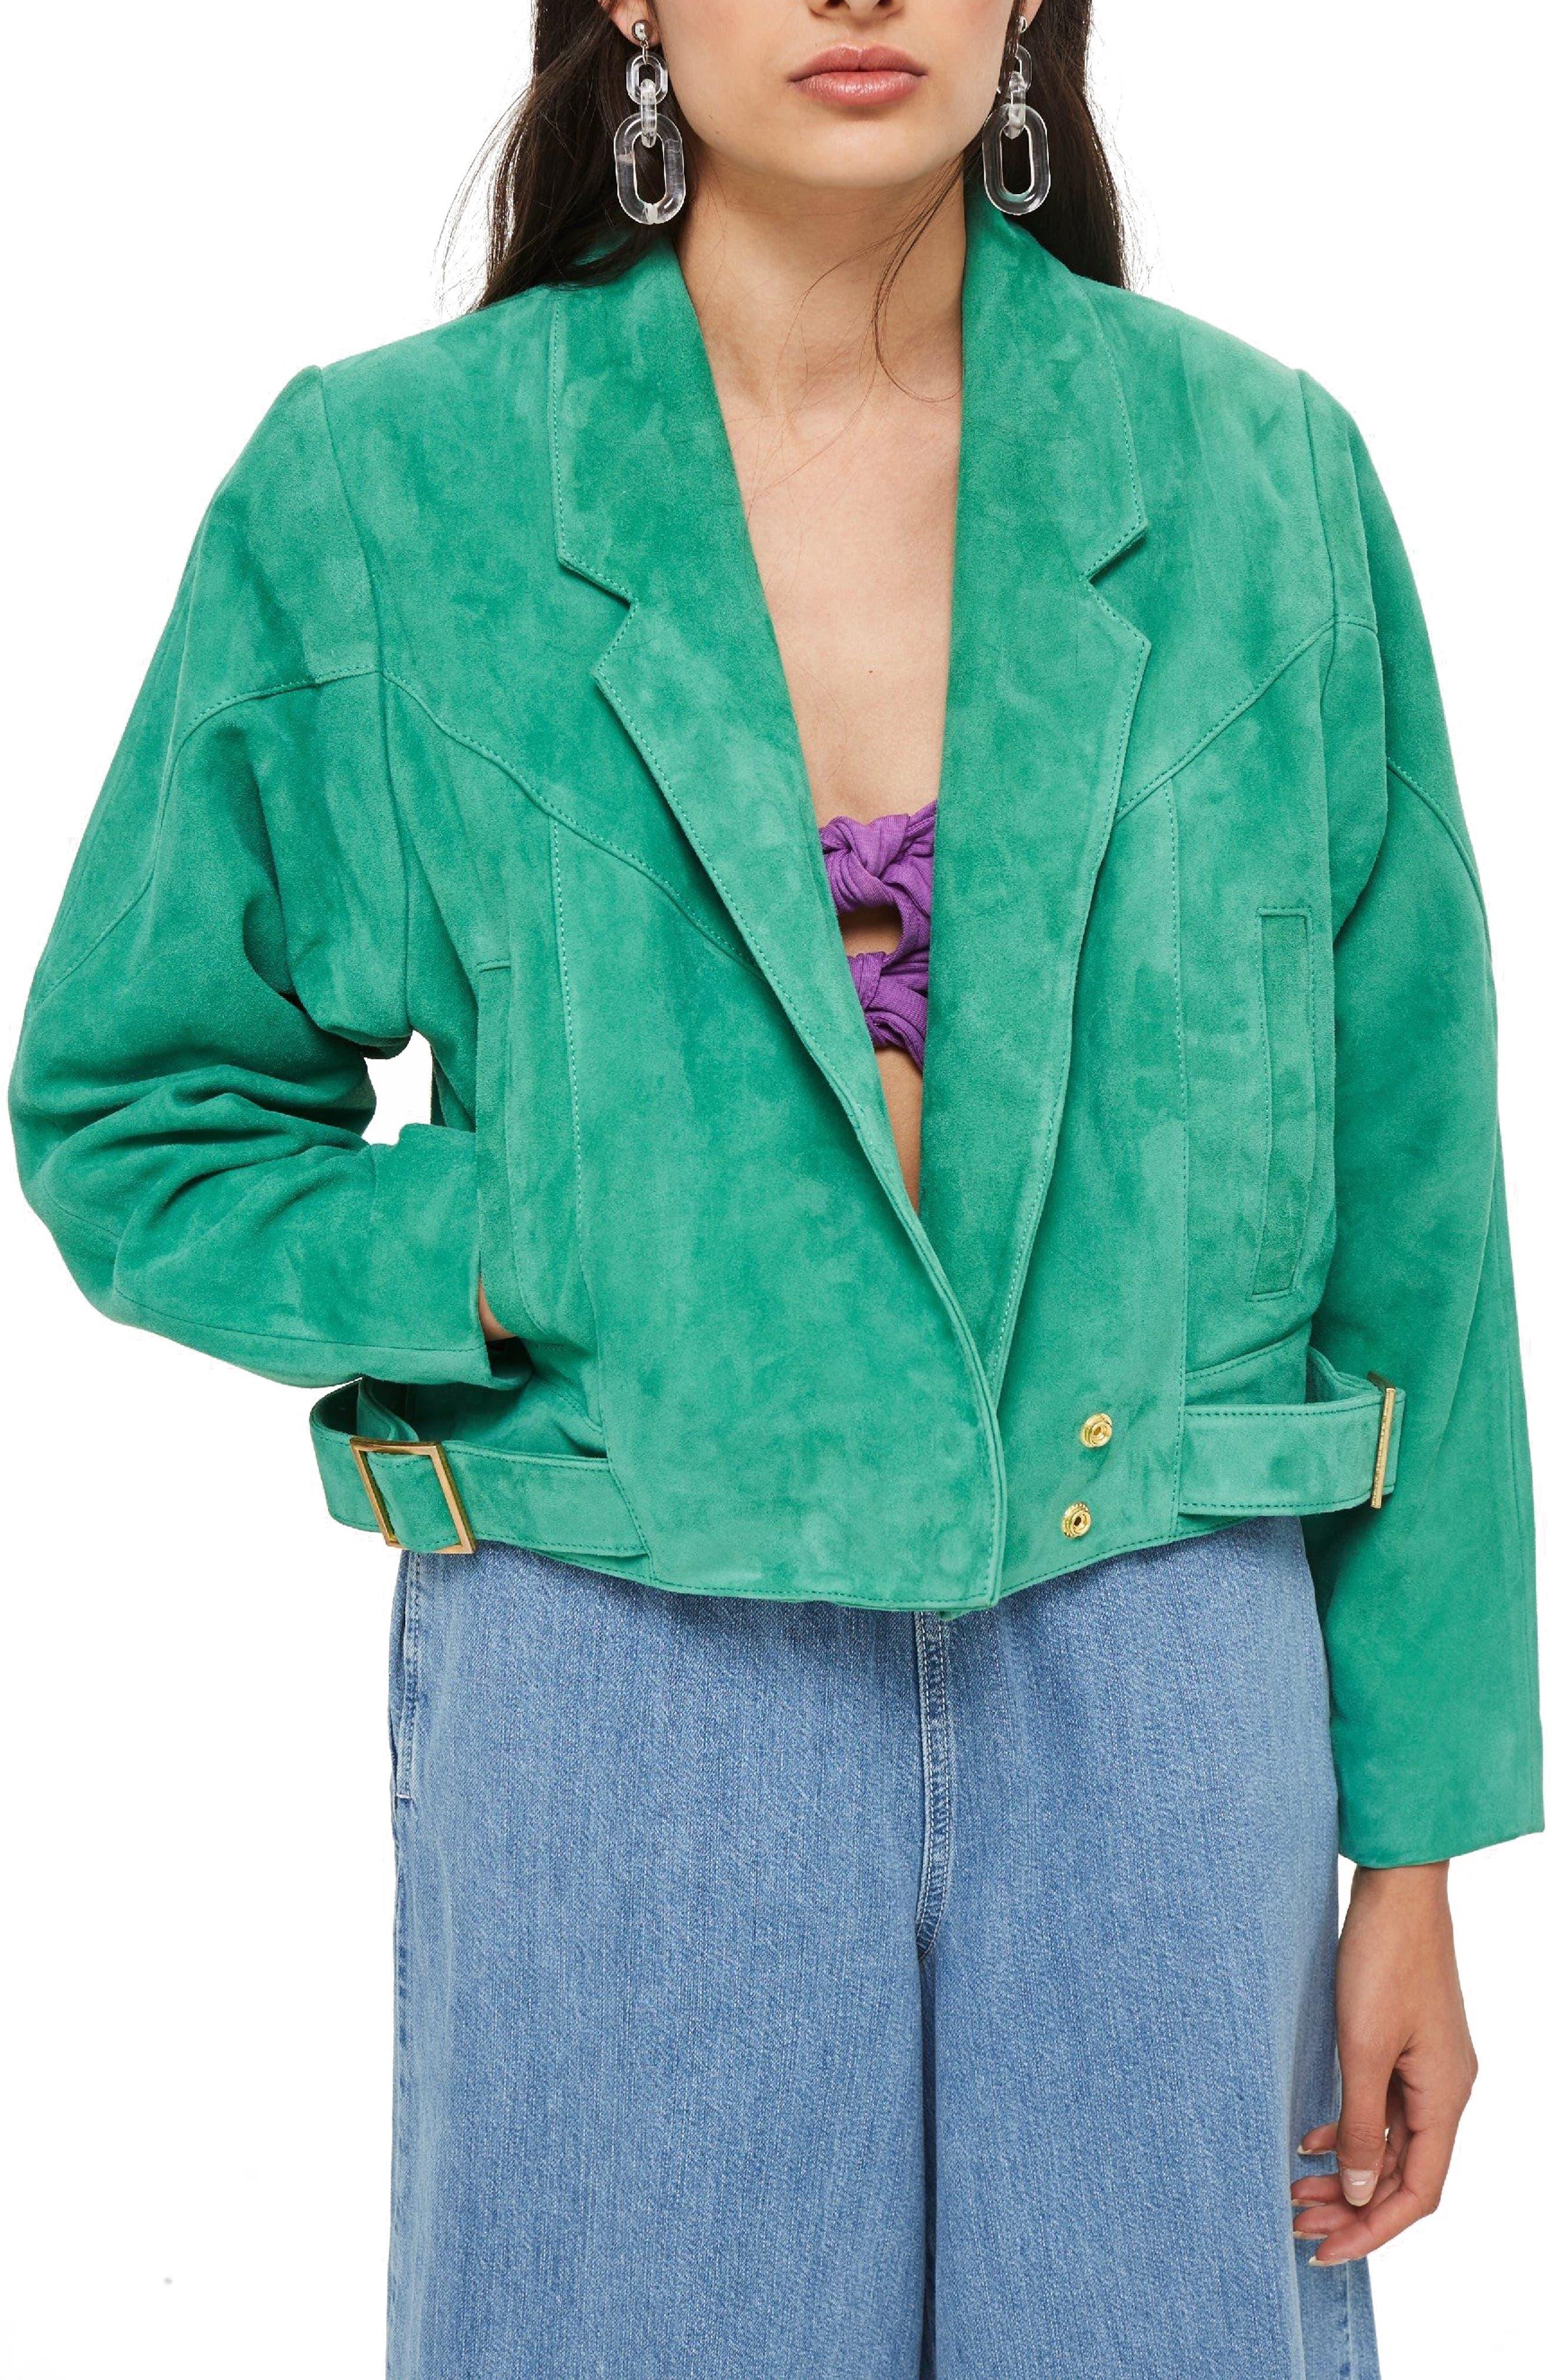 Hawkes Suede Jacket,                             Main thumbnail 1, color,                             Green